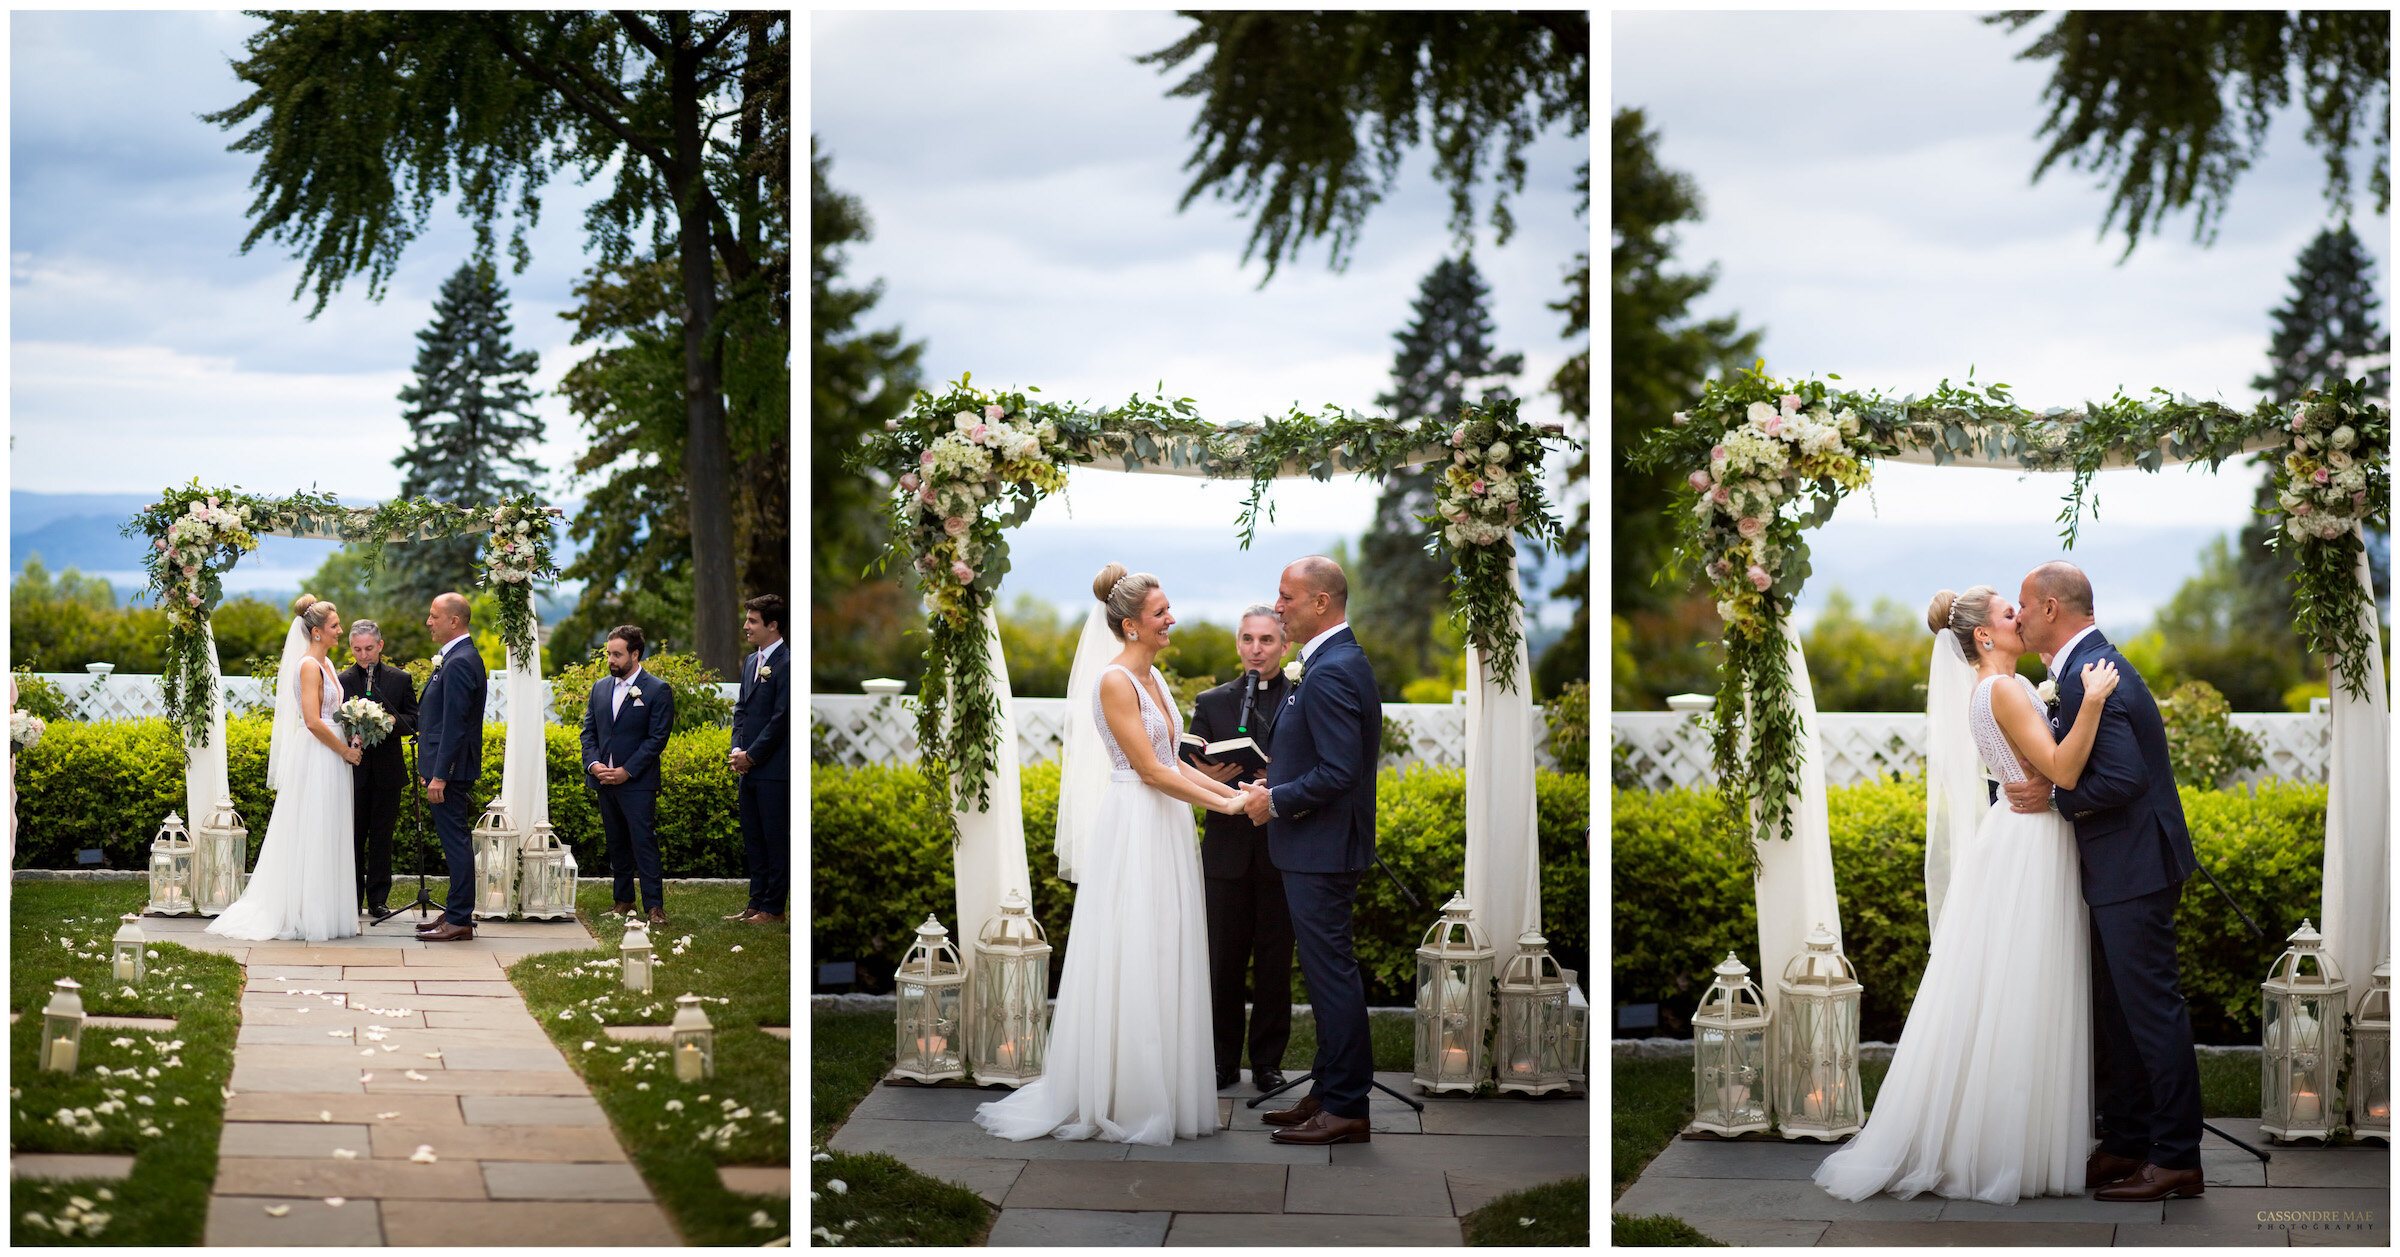 Cassondre Mae Photography Briarcliff Manor Wedding Photographer 5.jpg